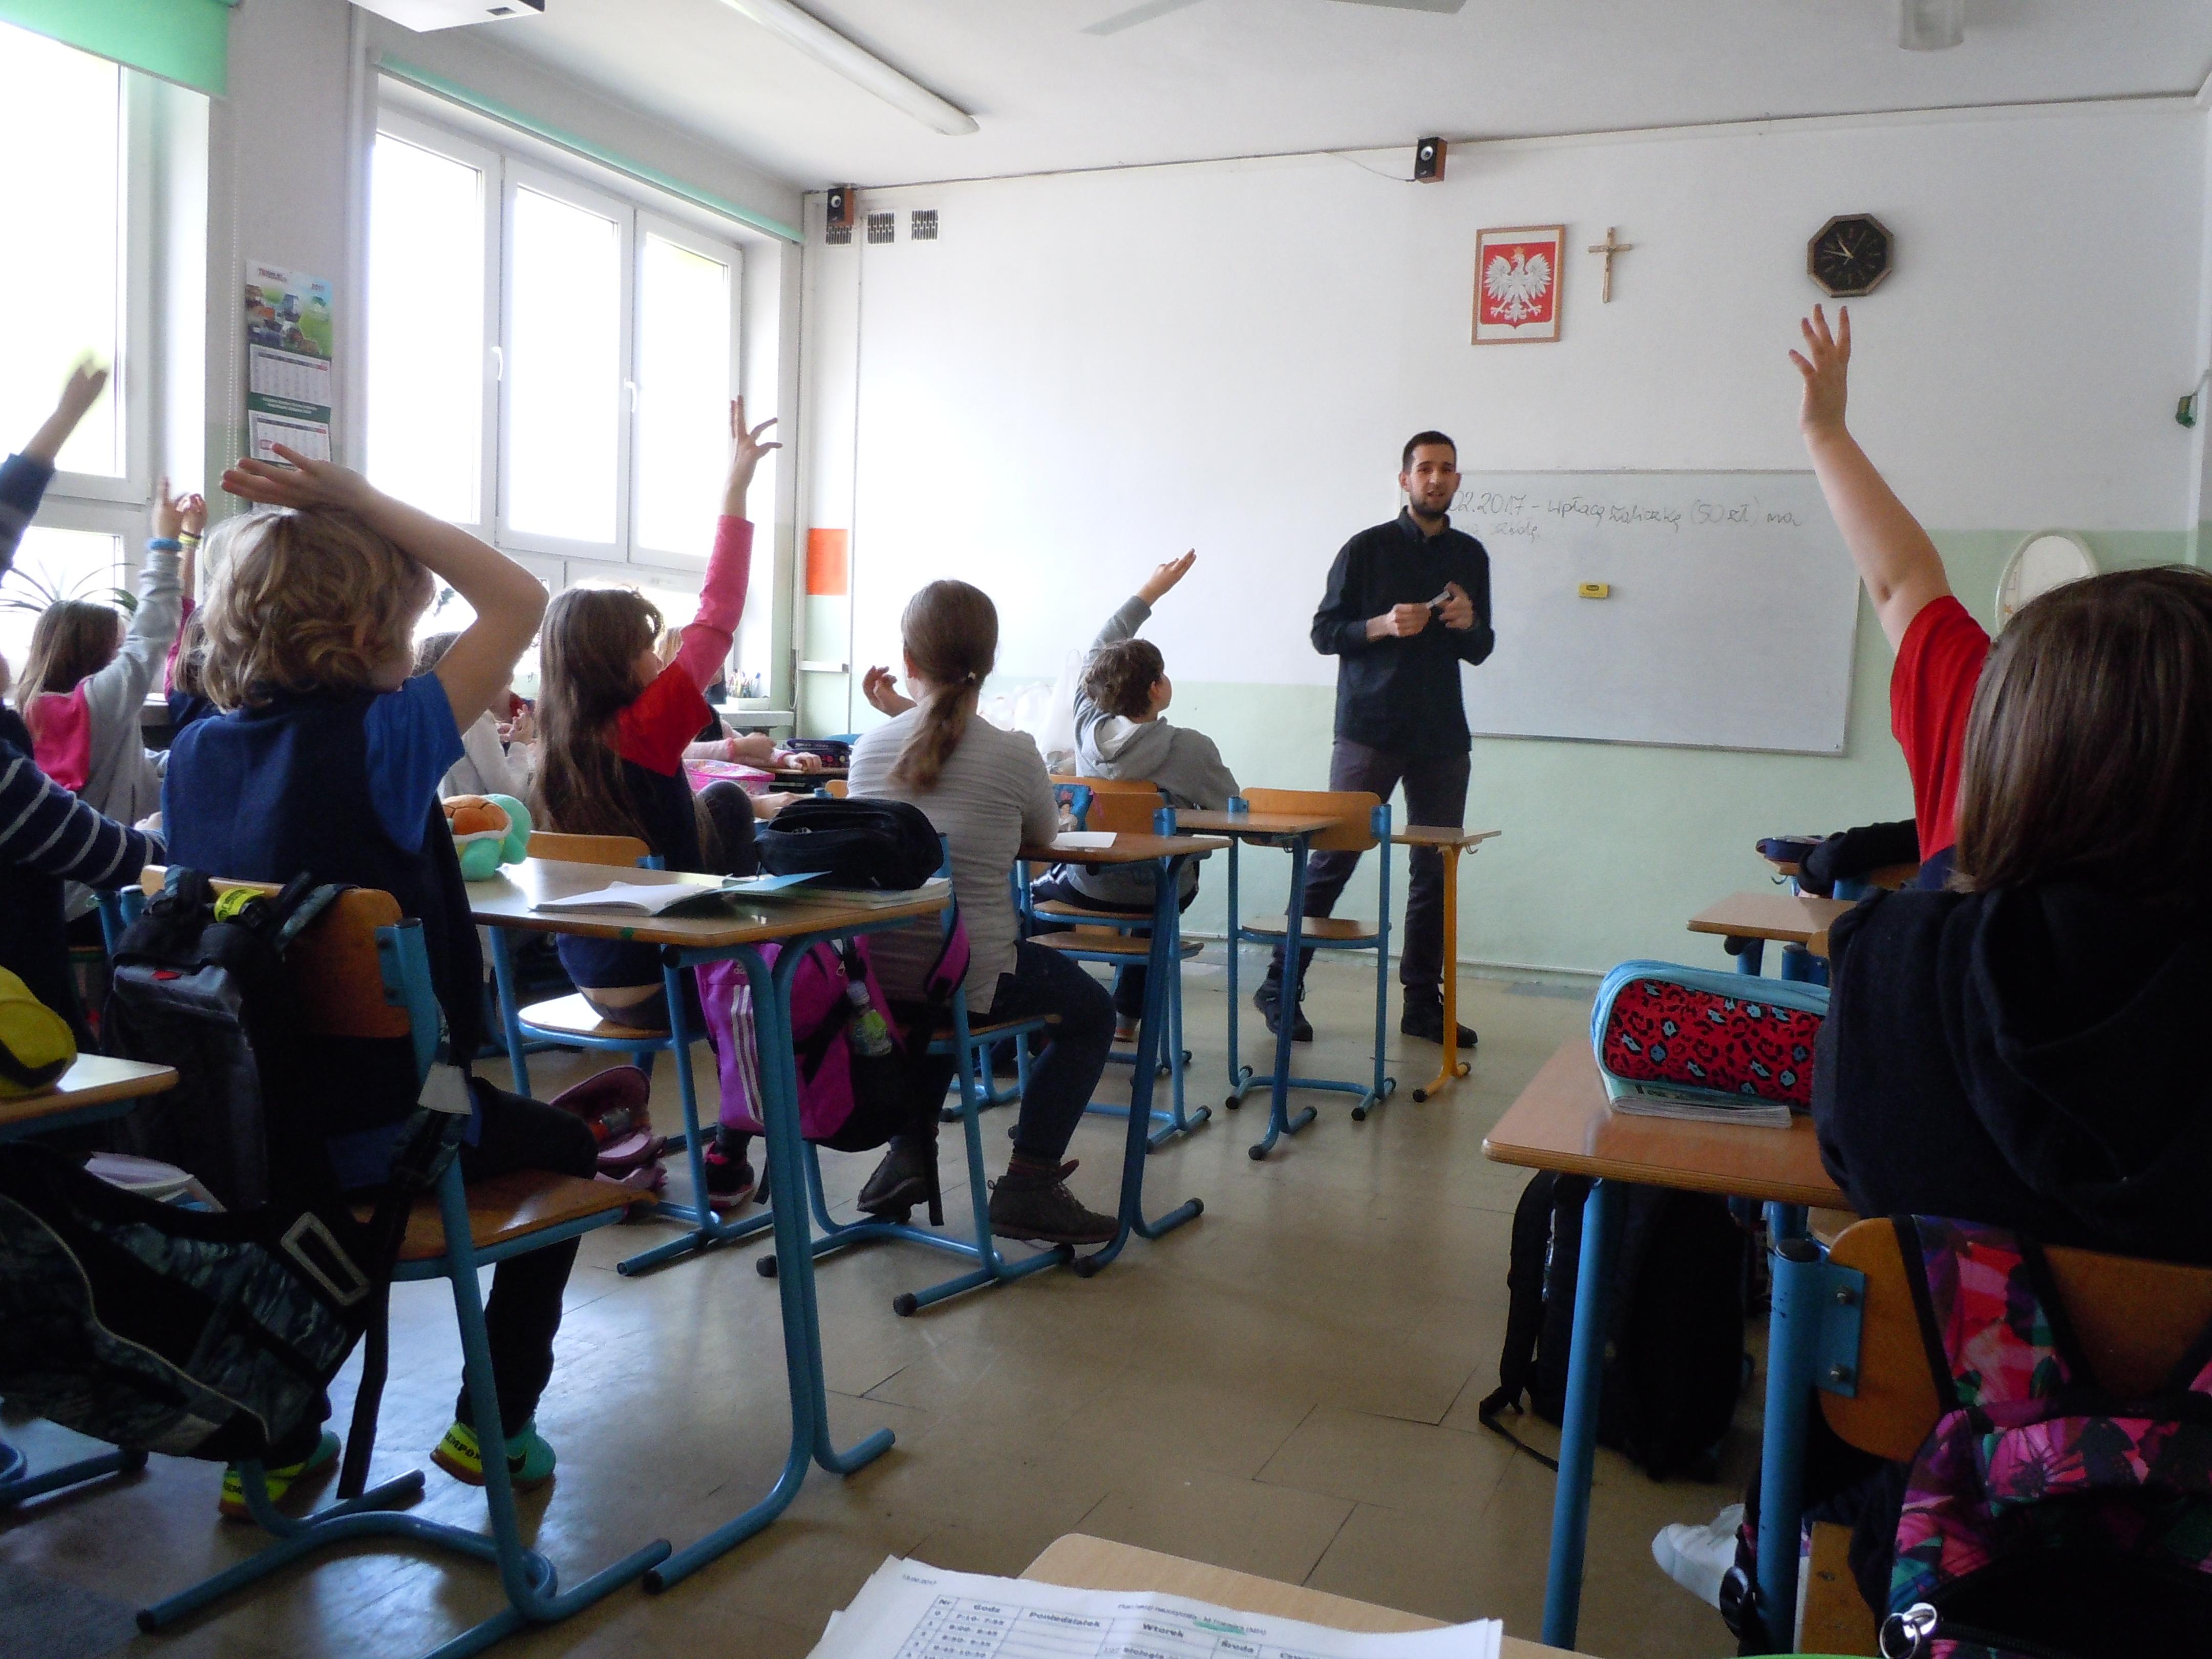 De Mota del Cuervo a Cracovia. Aprendizaje cooperativo más allá del aula